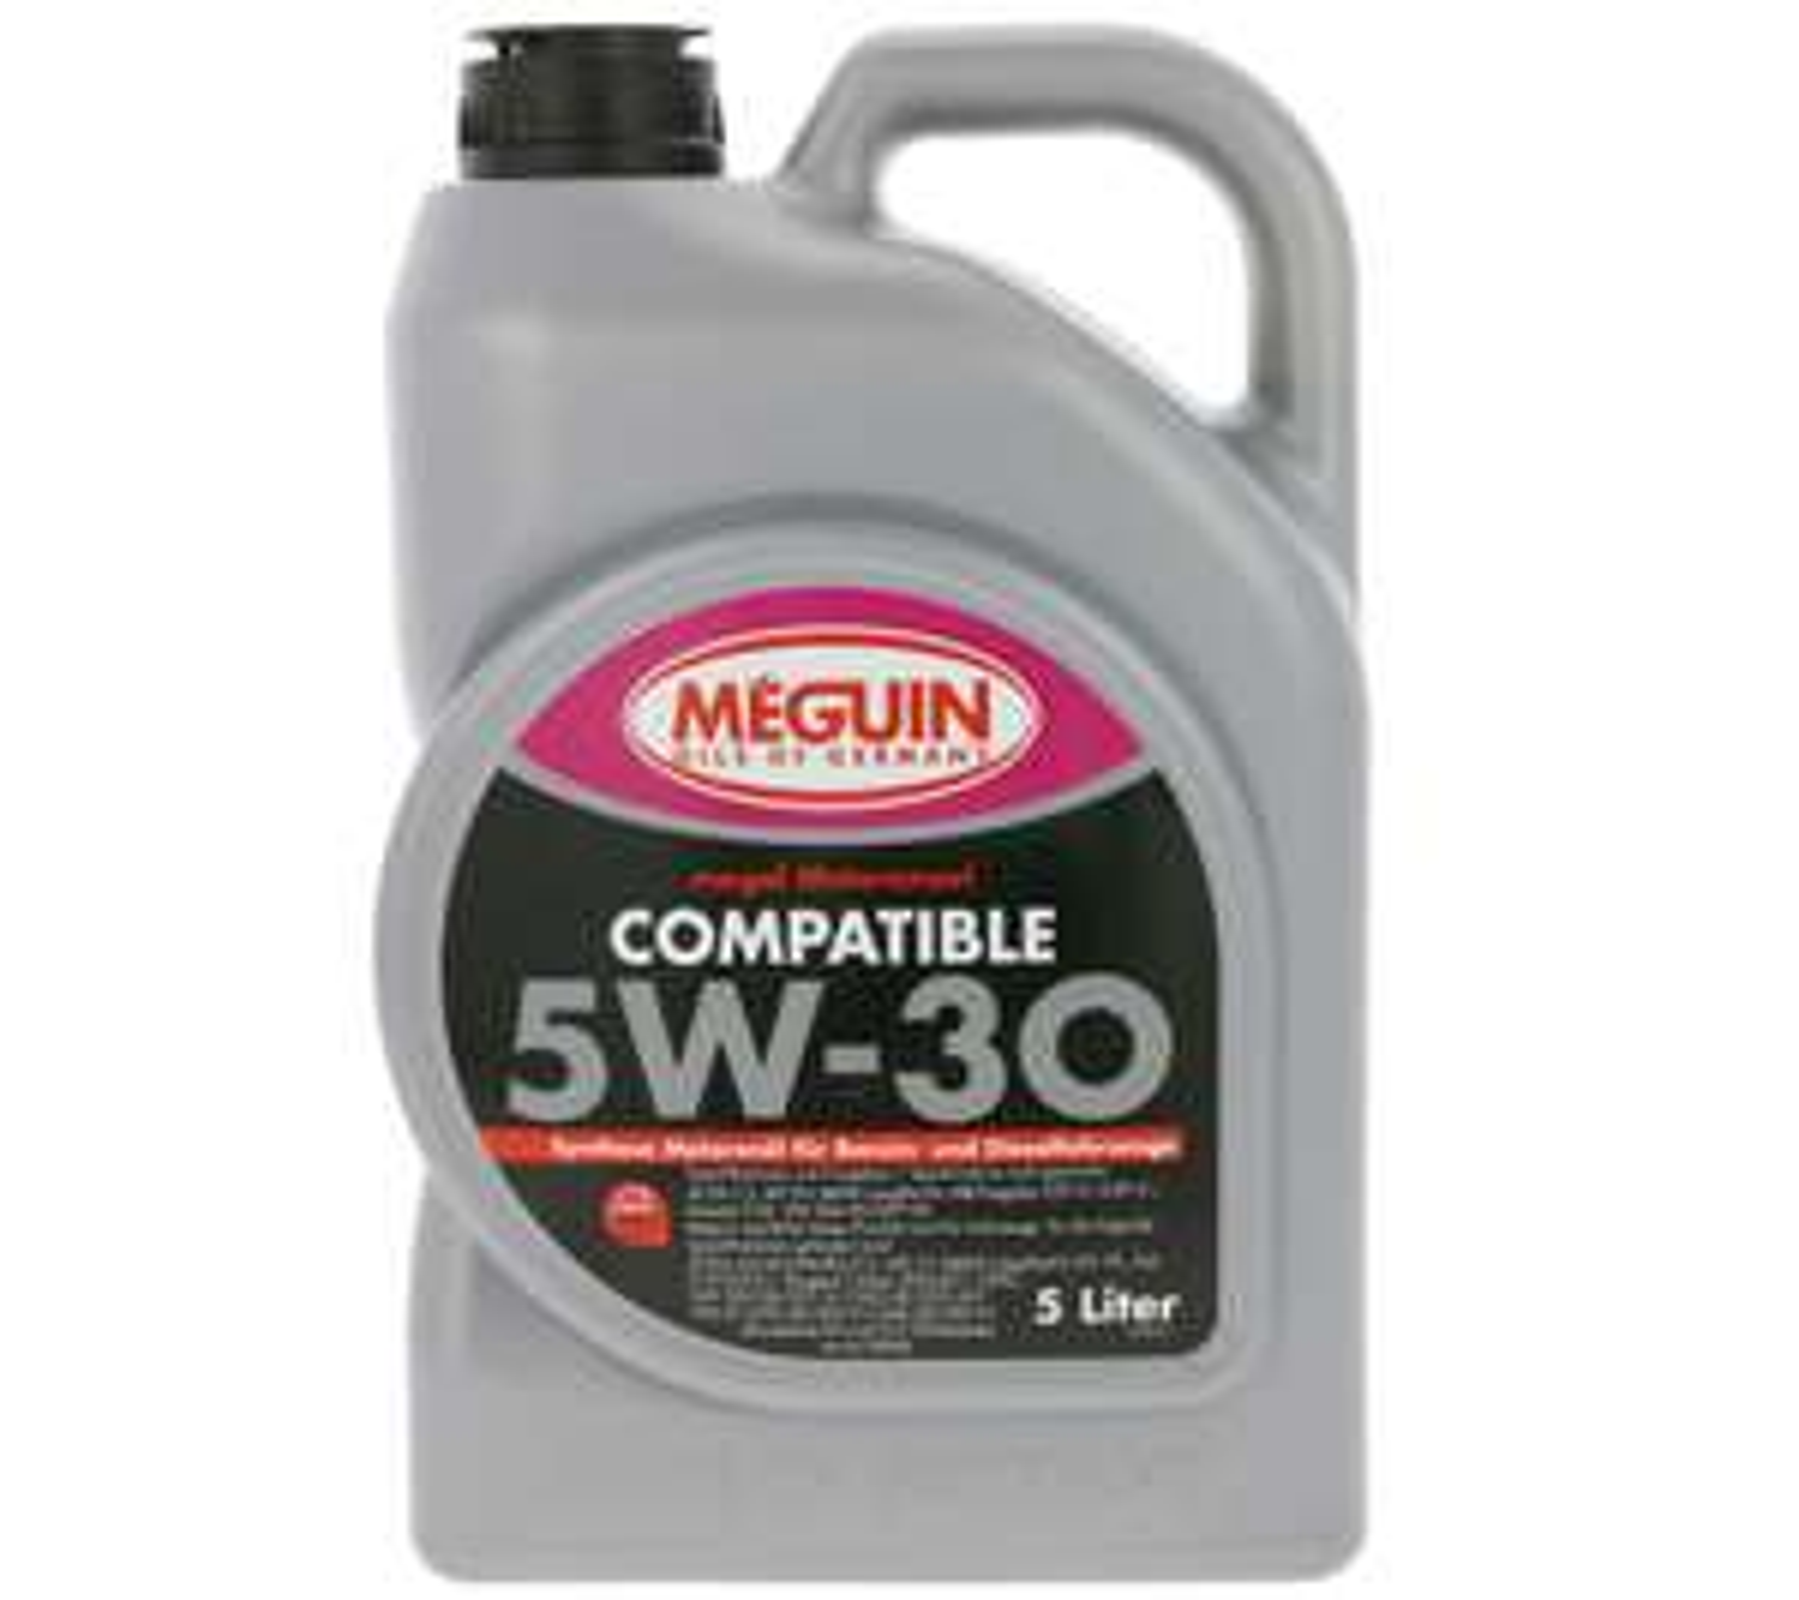 [Outlet46] 5L MEGUIN Megol Compatible Longlife Motoröl 5W-30 VW 504 00 | 507 00